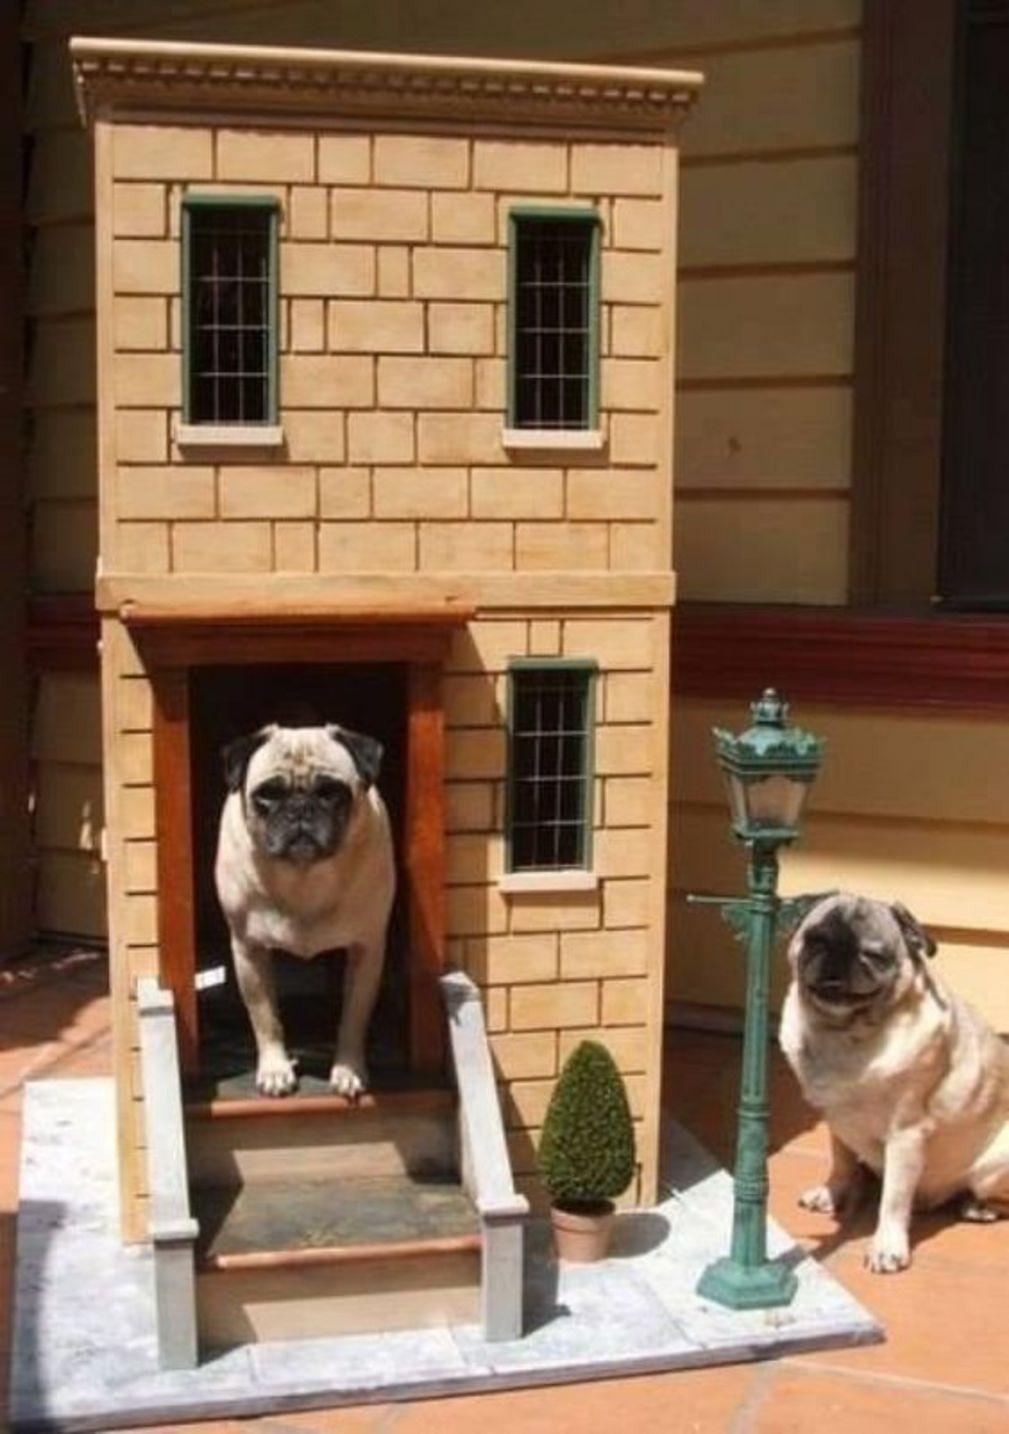 10 id es de niches pour chien hyper originales animalaxy - Idee niche pour chien ...